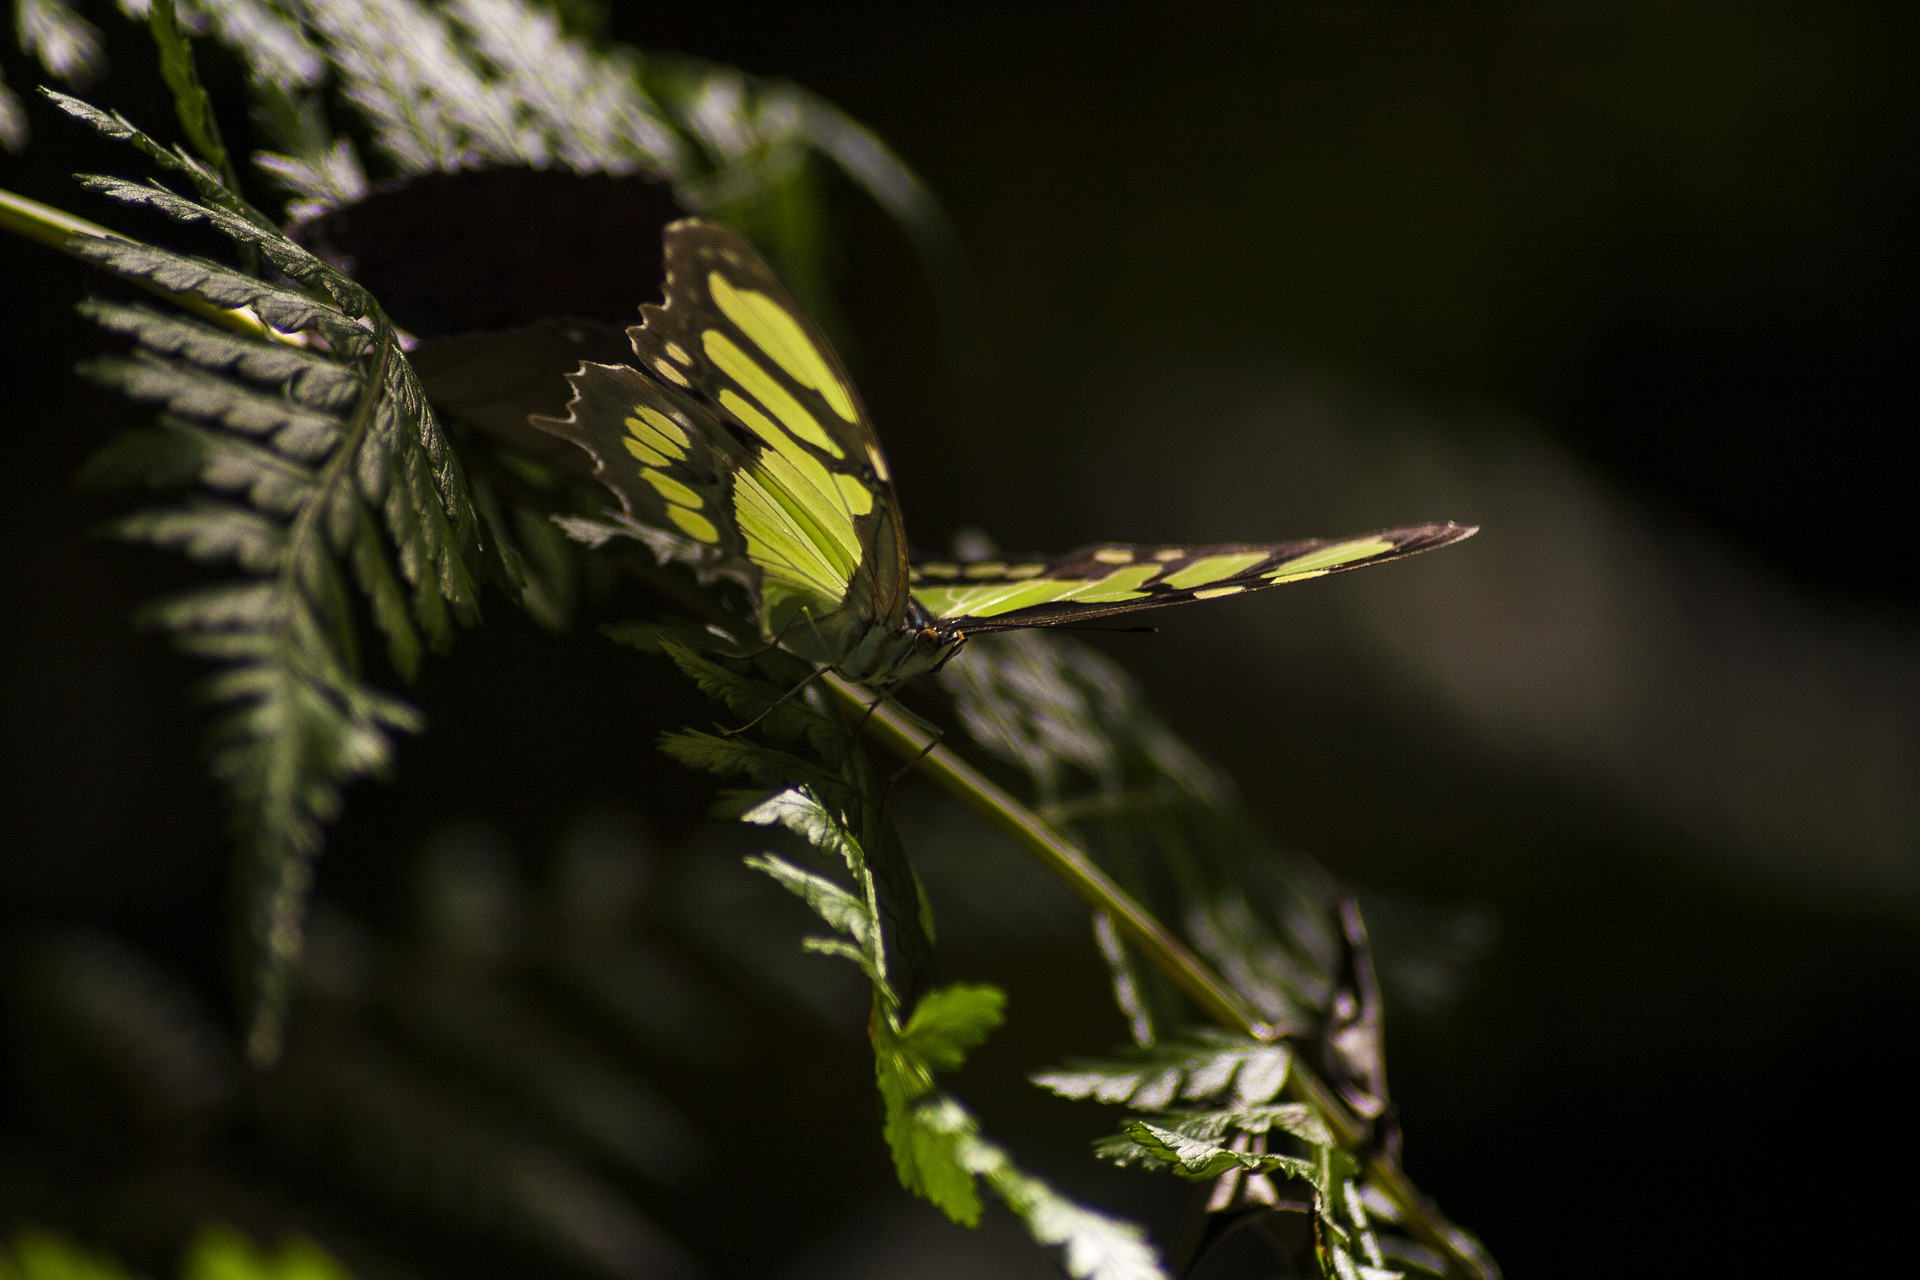 GYCAF butterfly-4301168_1920